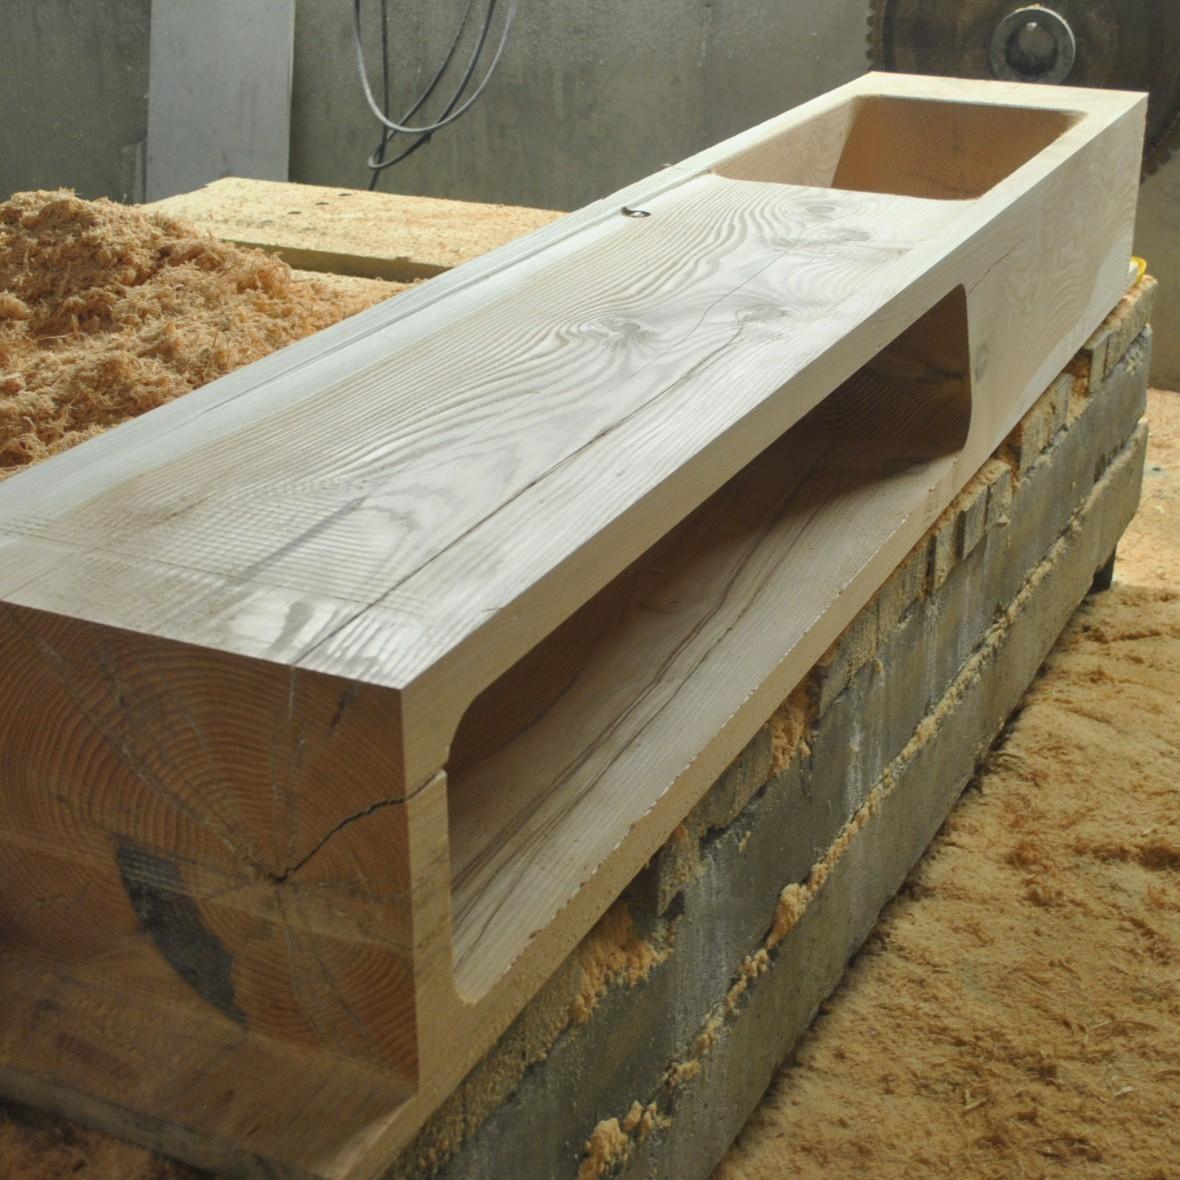 Küchenmöbel aus Holz